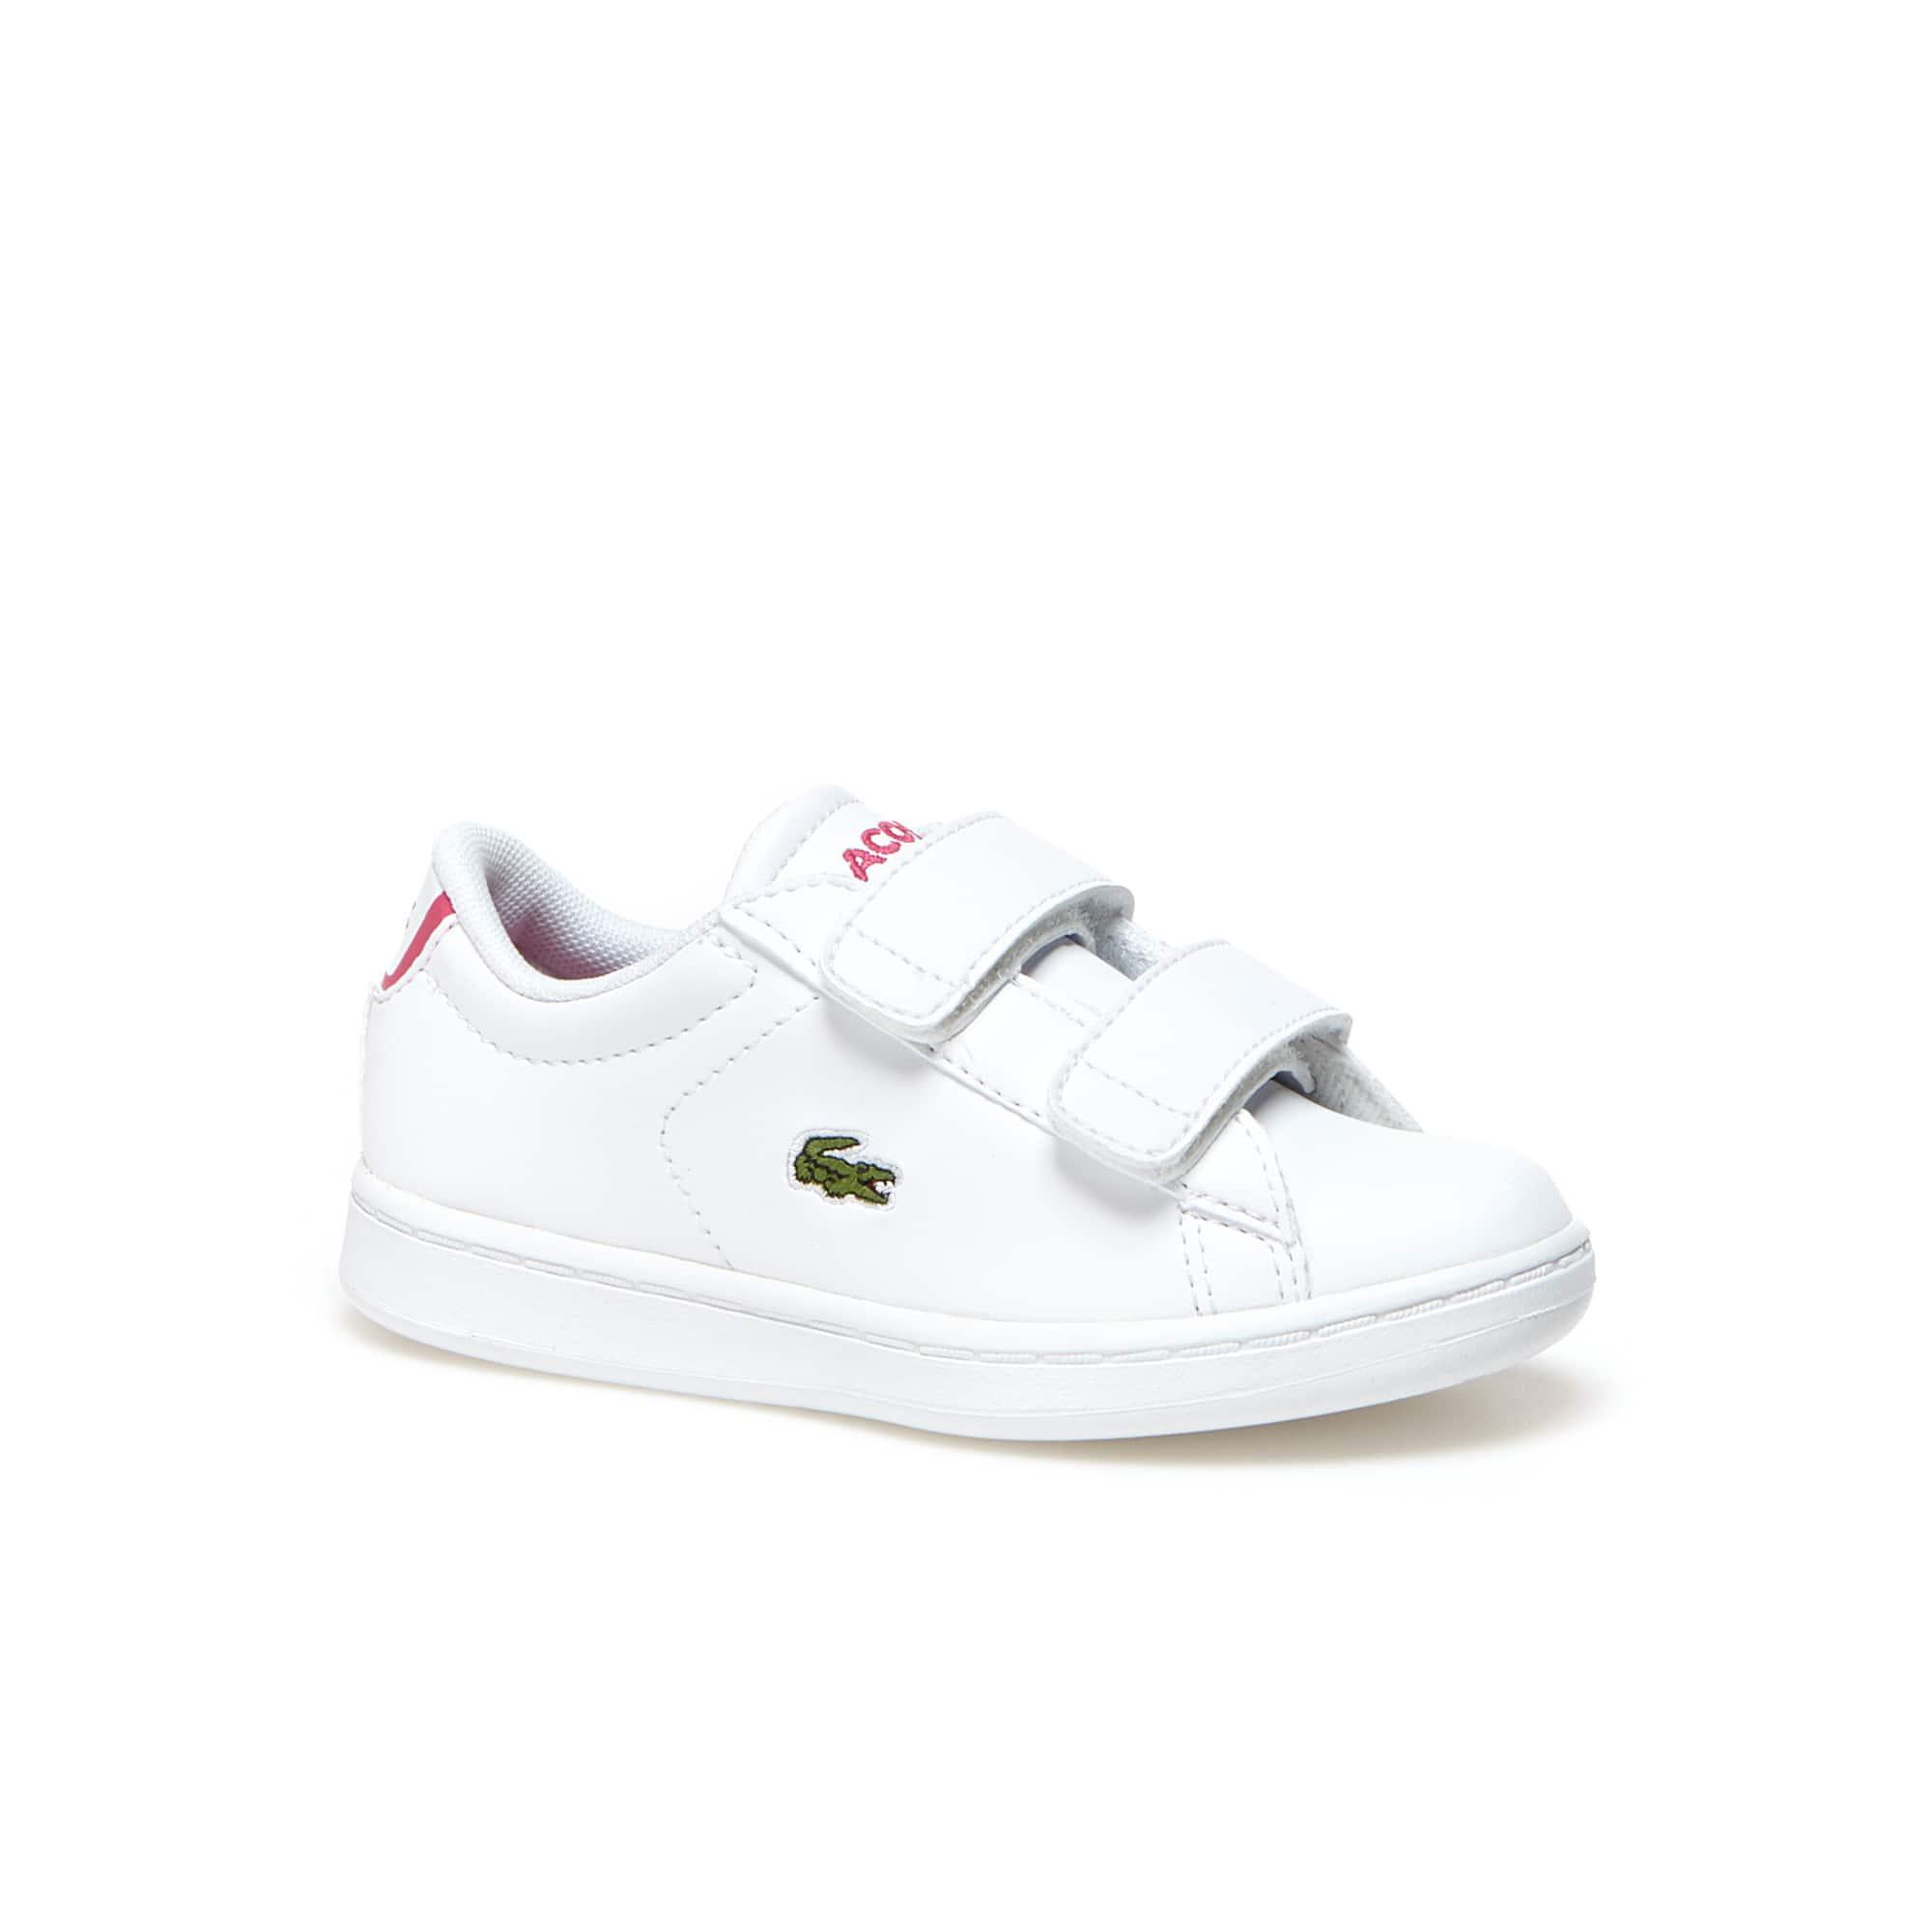 Chaussures Sneakers Enfant Sneakers Enfant Lacoste Chaussures Chaussures Enfant Lacoste Sneakers w6tqB6rxf